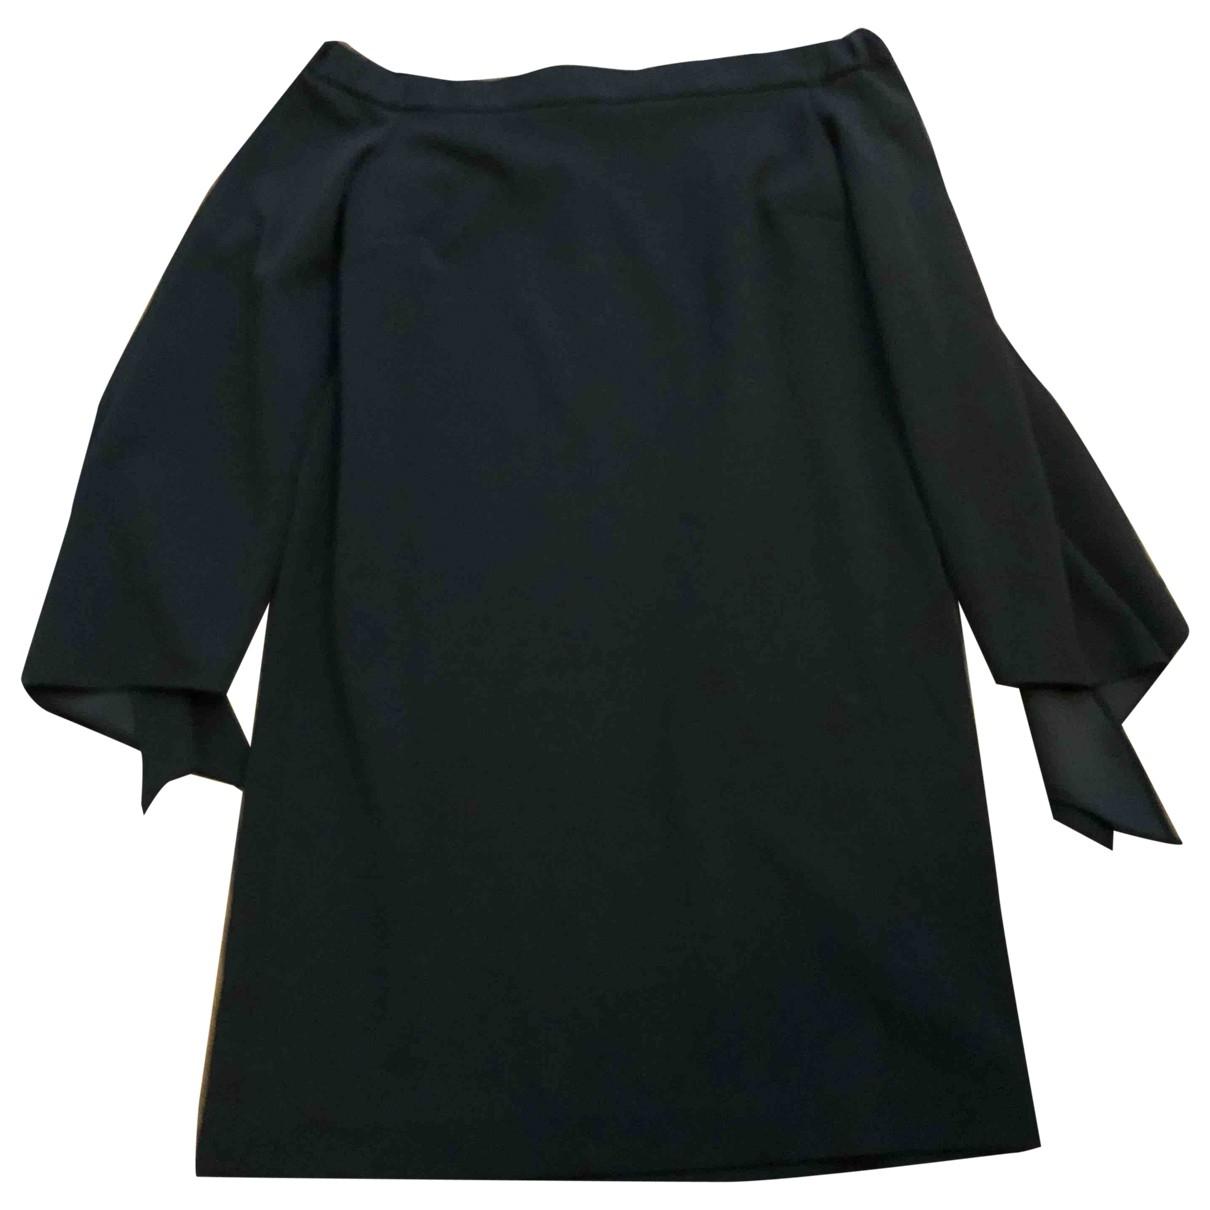 Tibi \N Kleid in  Schwarz Polyester